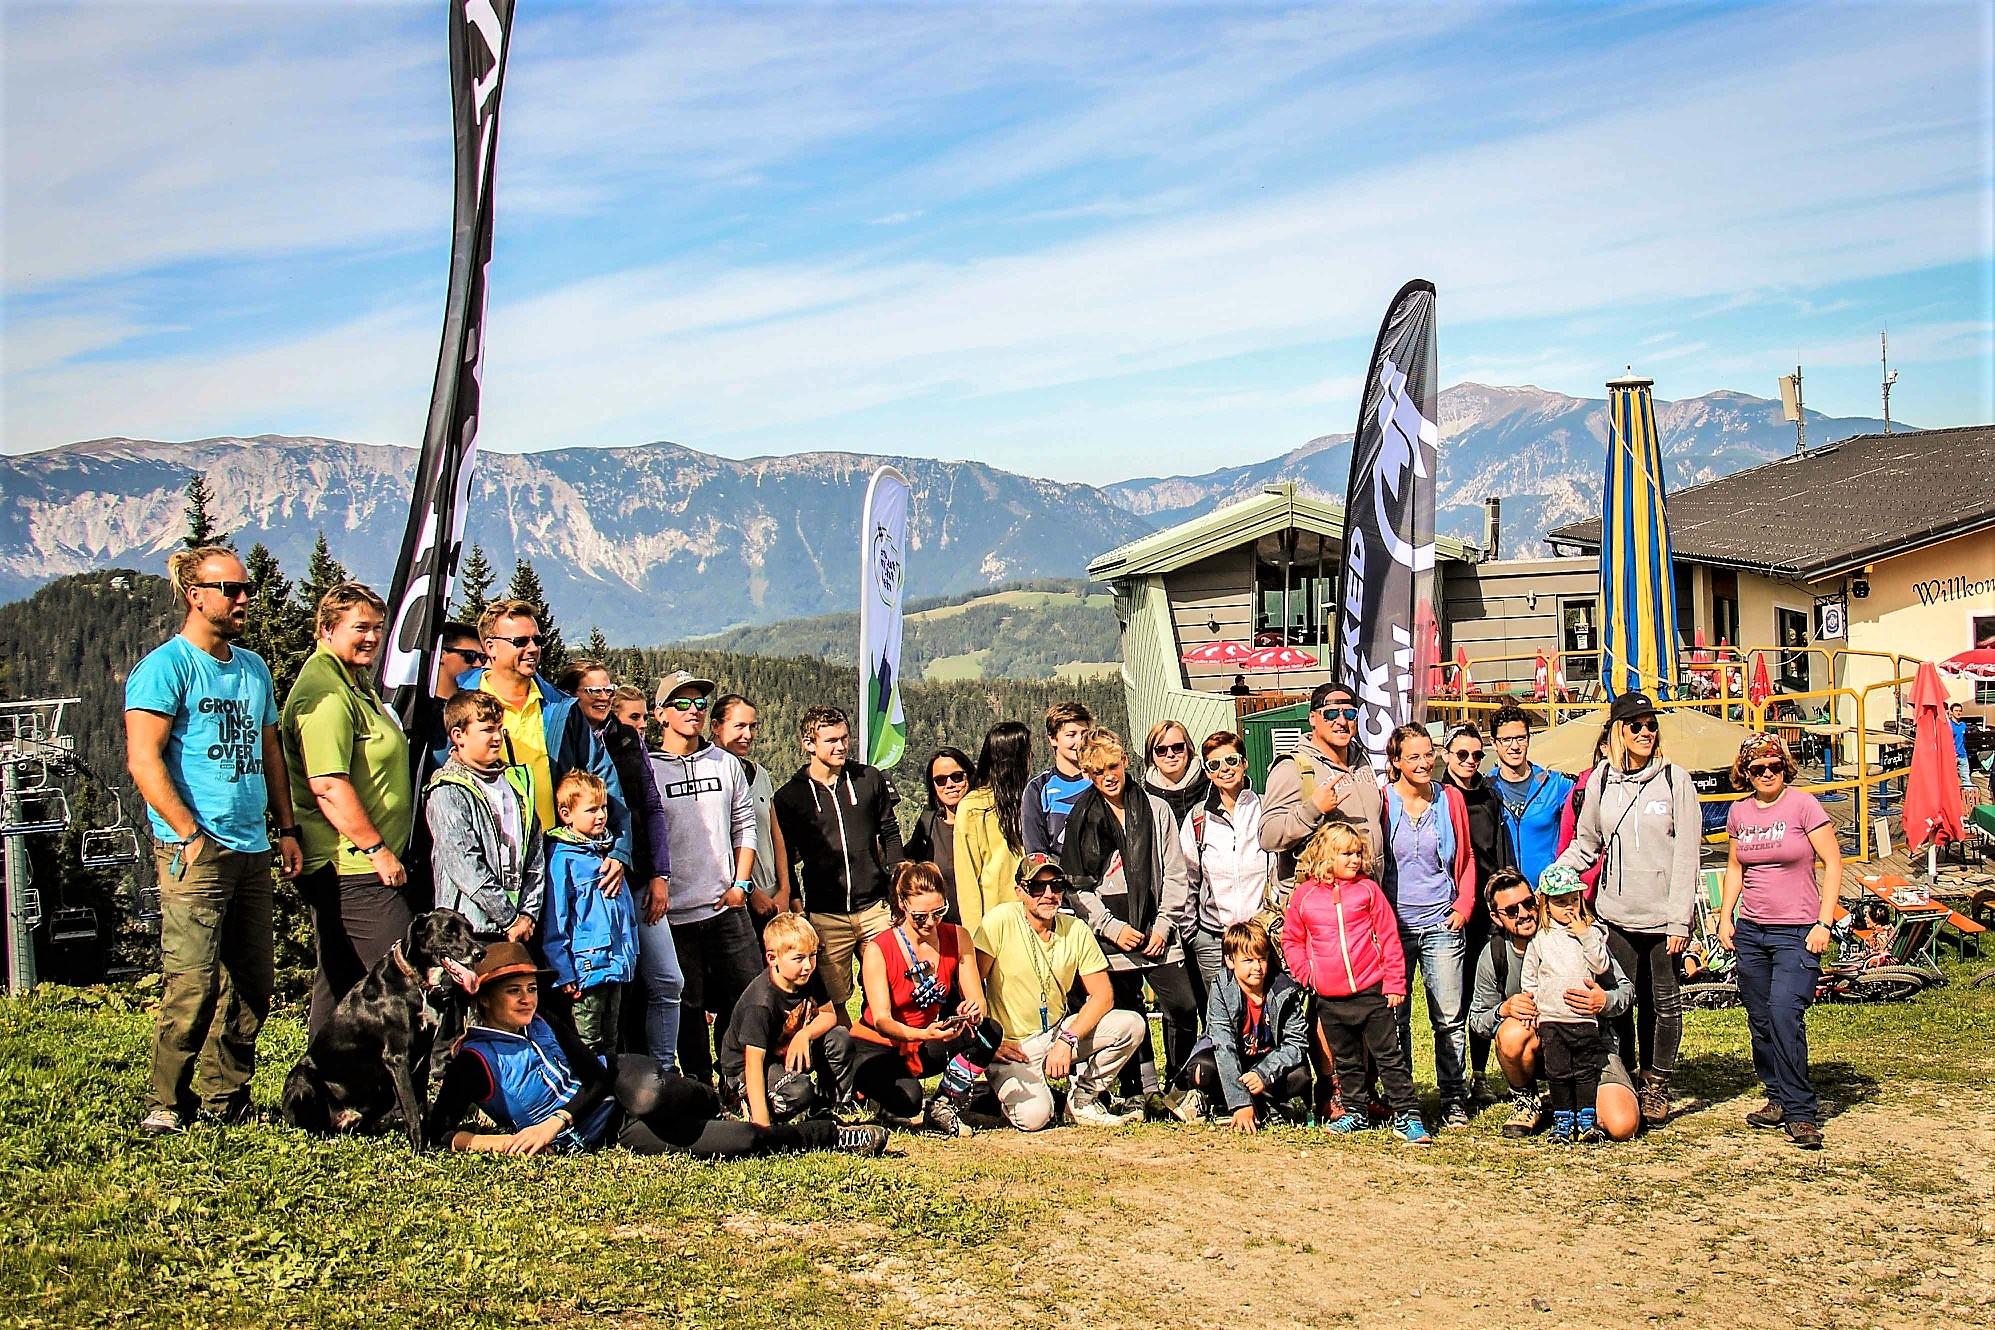 Am 26. September ist wieder Mountain Clean Up Day am Zauberberg